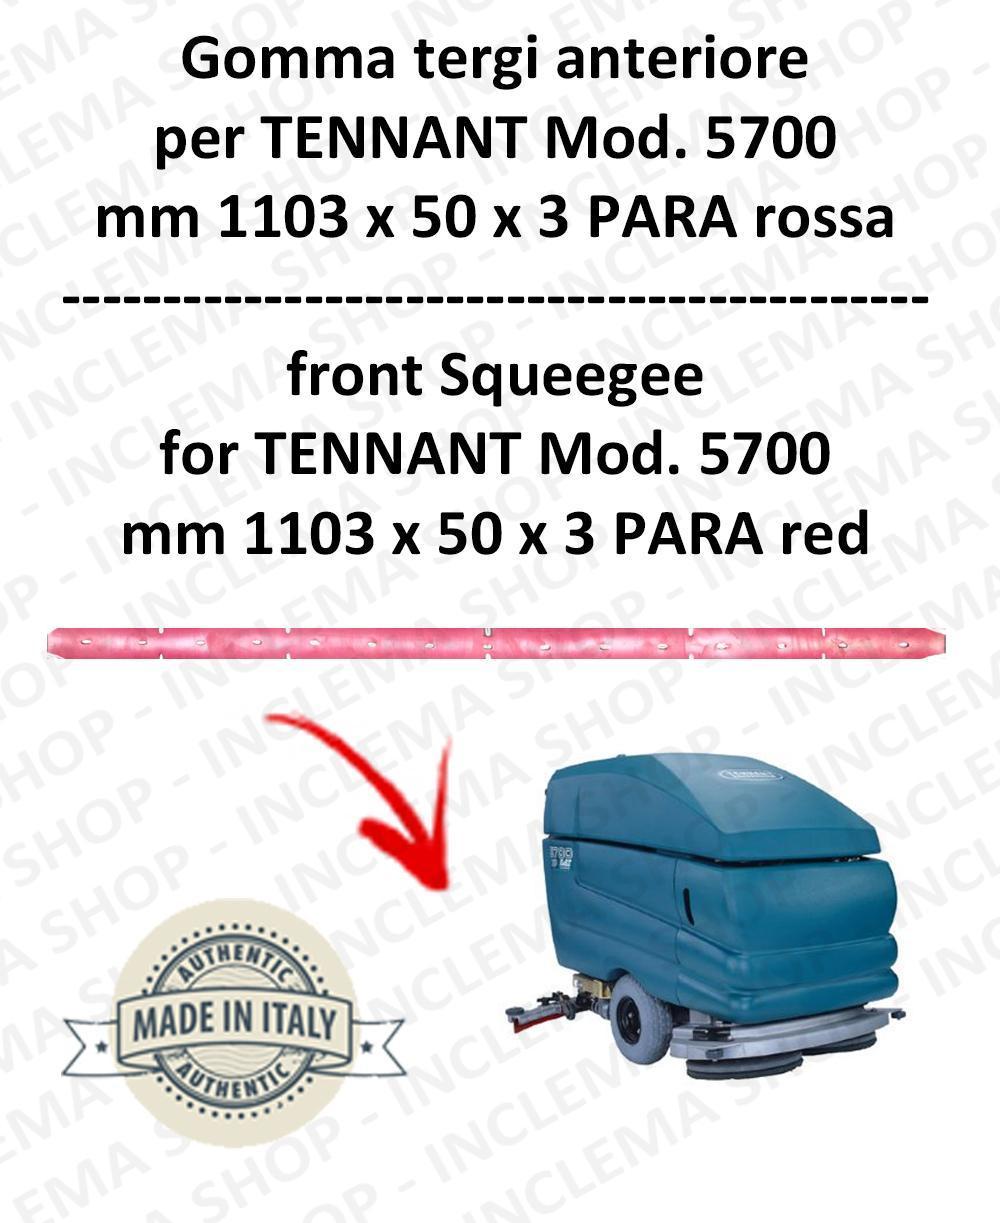 5700 goma de secado delantera PARA rojo para fregadora TENNANT - squeegee 800 mm